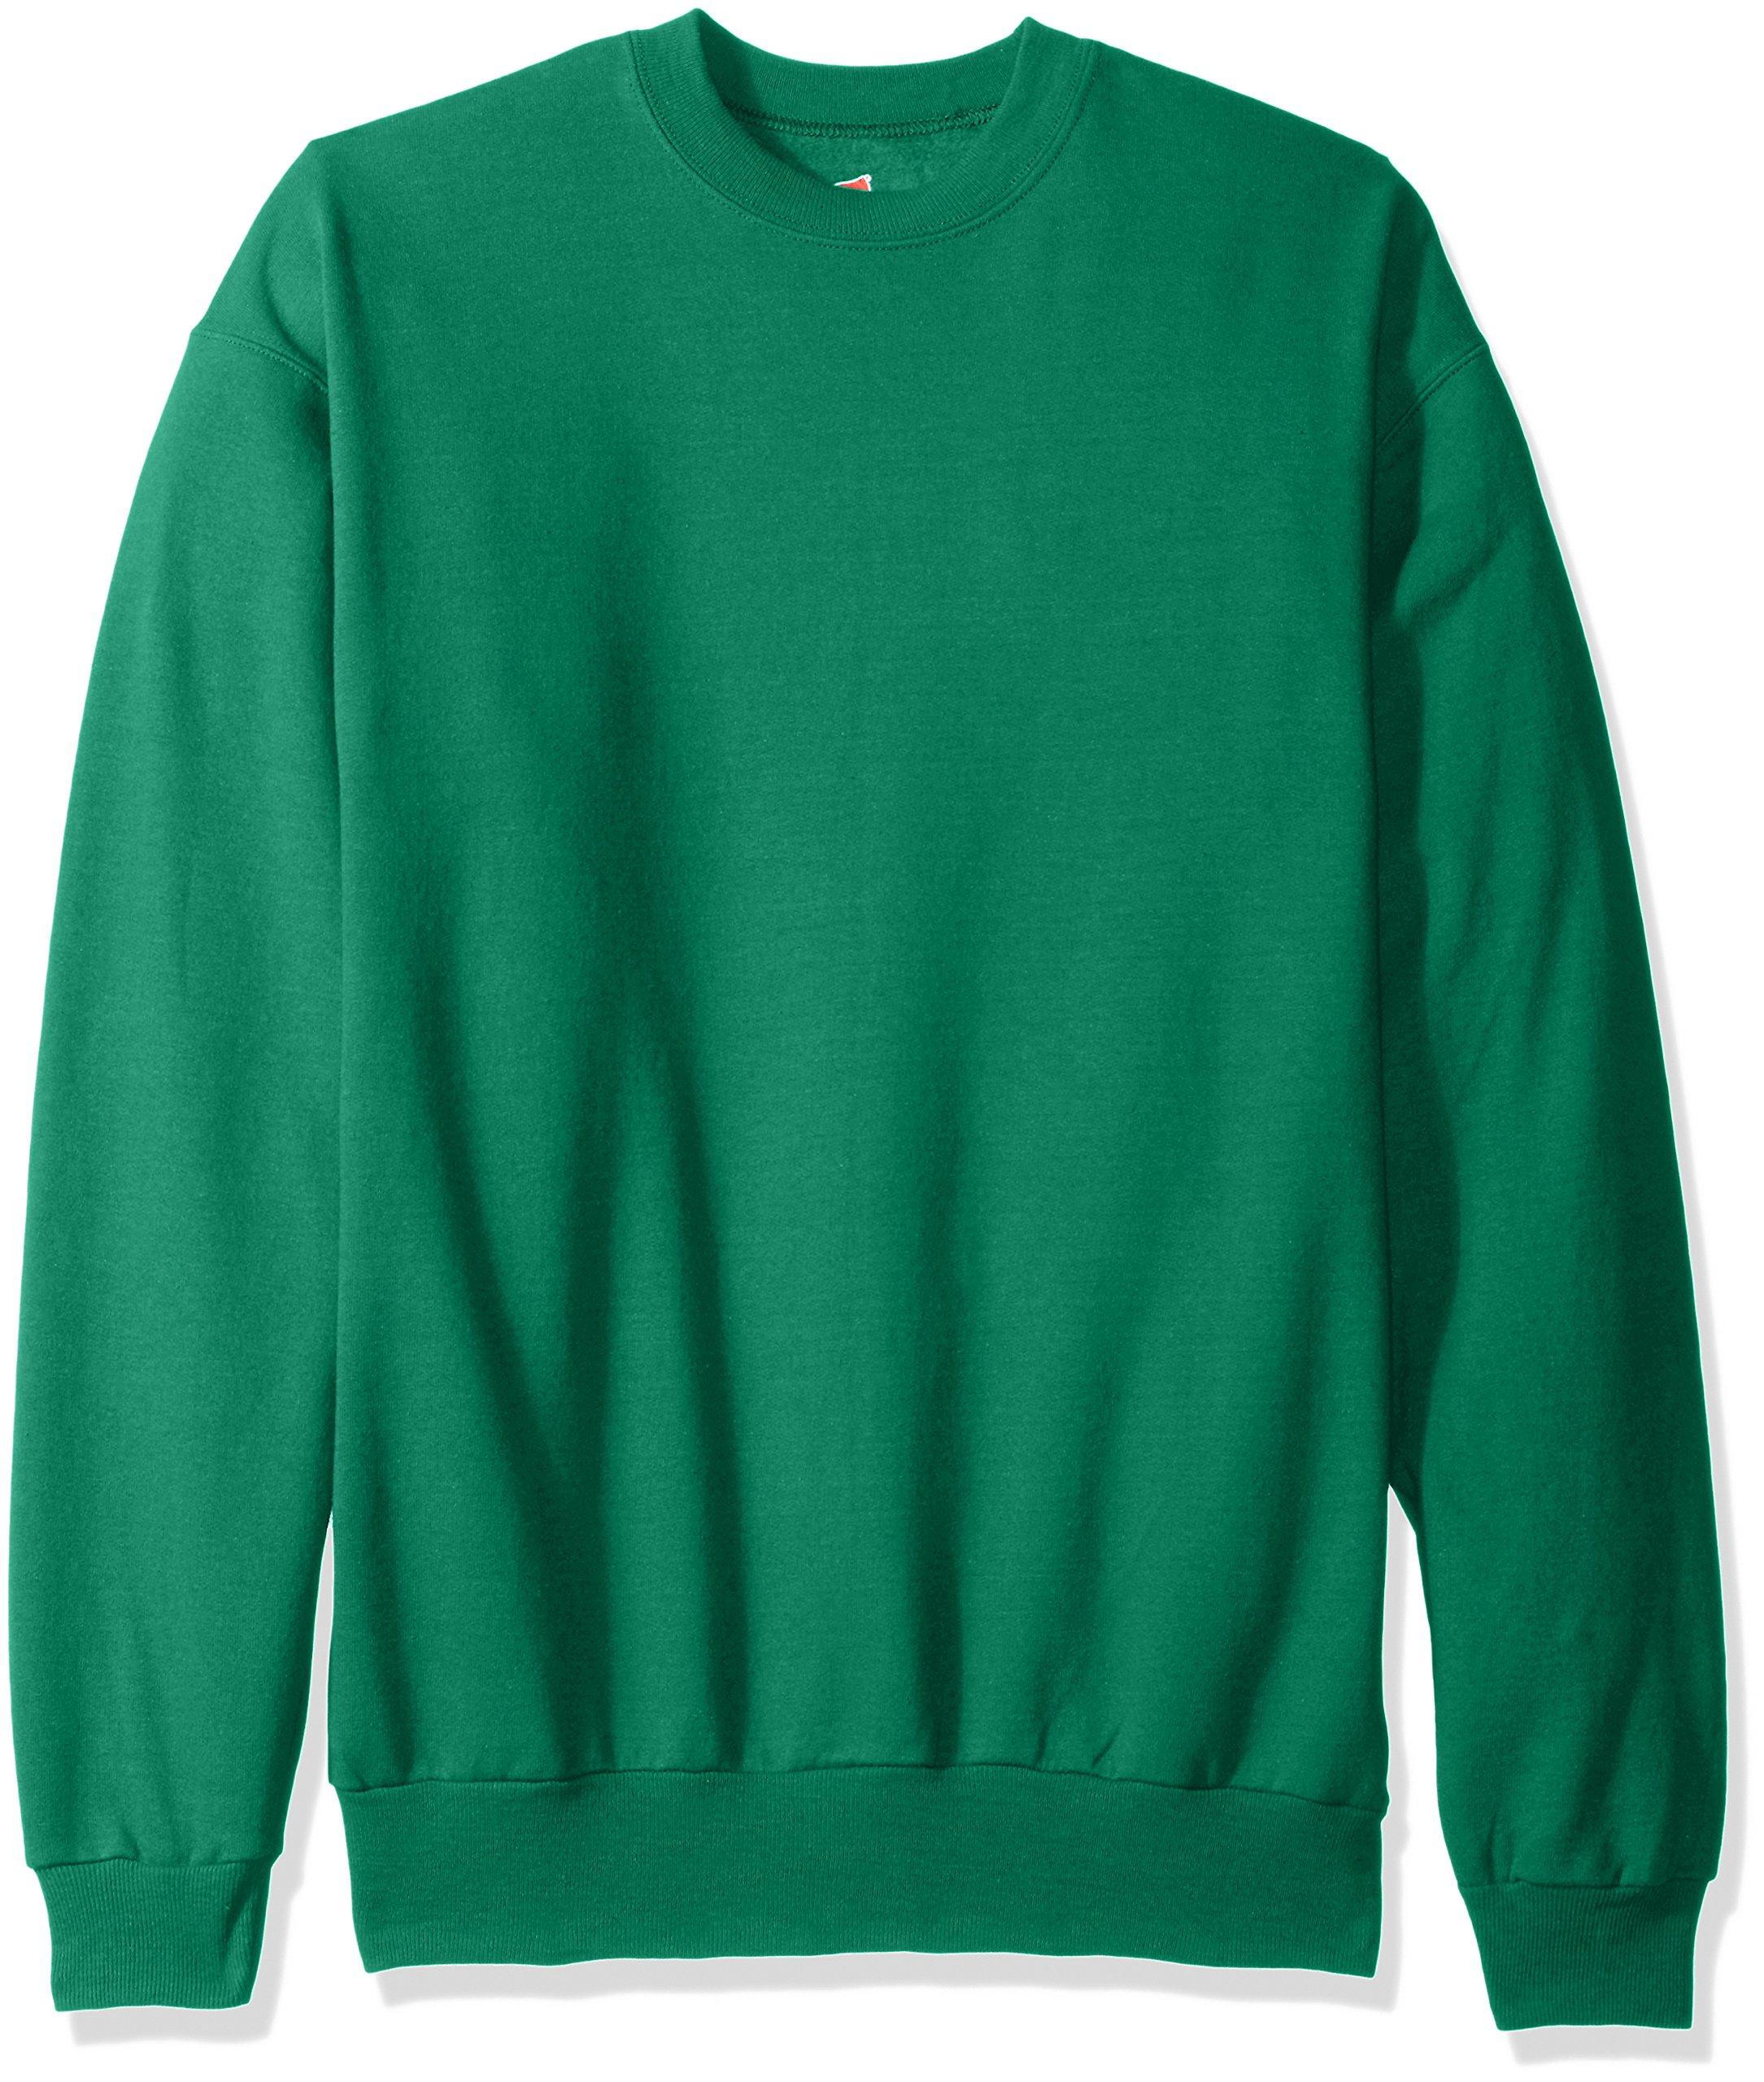 Hanes Men's EcoSmart Fleece Sweatshirt, Kelly Green, Small by Hanes